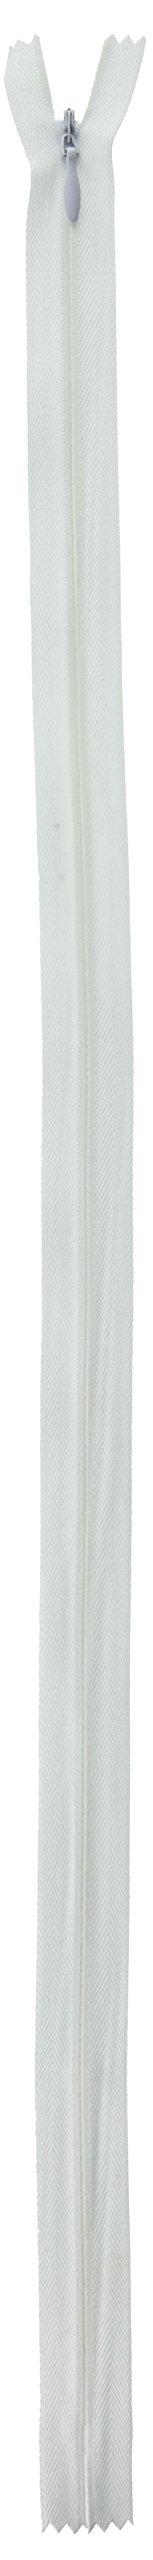 Coats & Clark F8422-WHT Invisible Zipper, 20 x 22, White